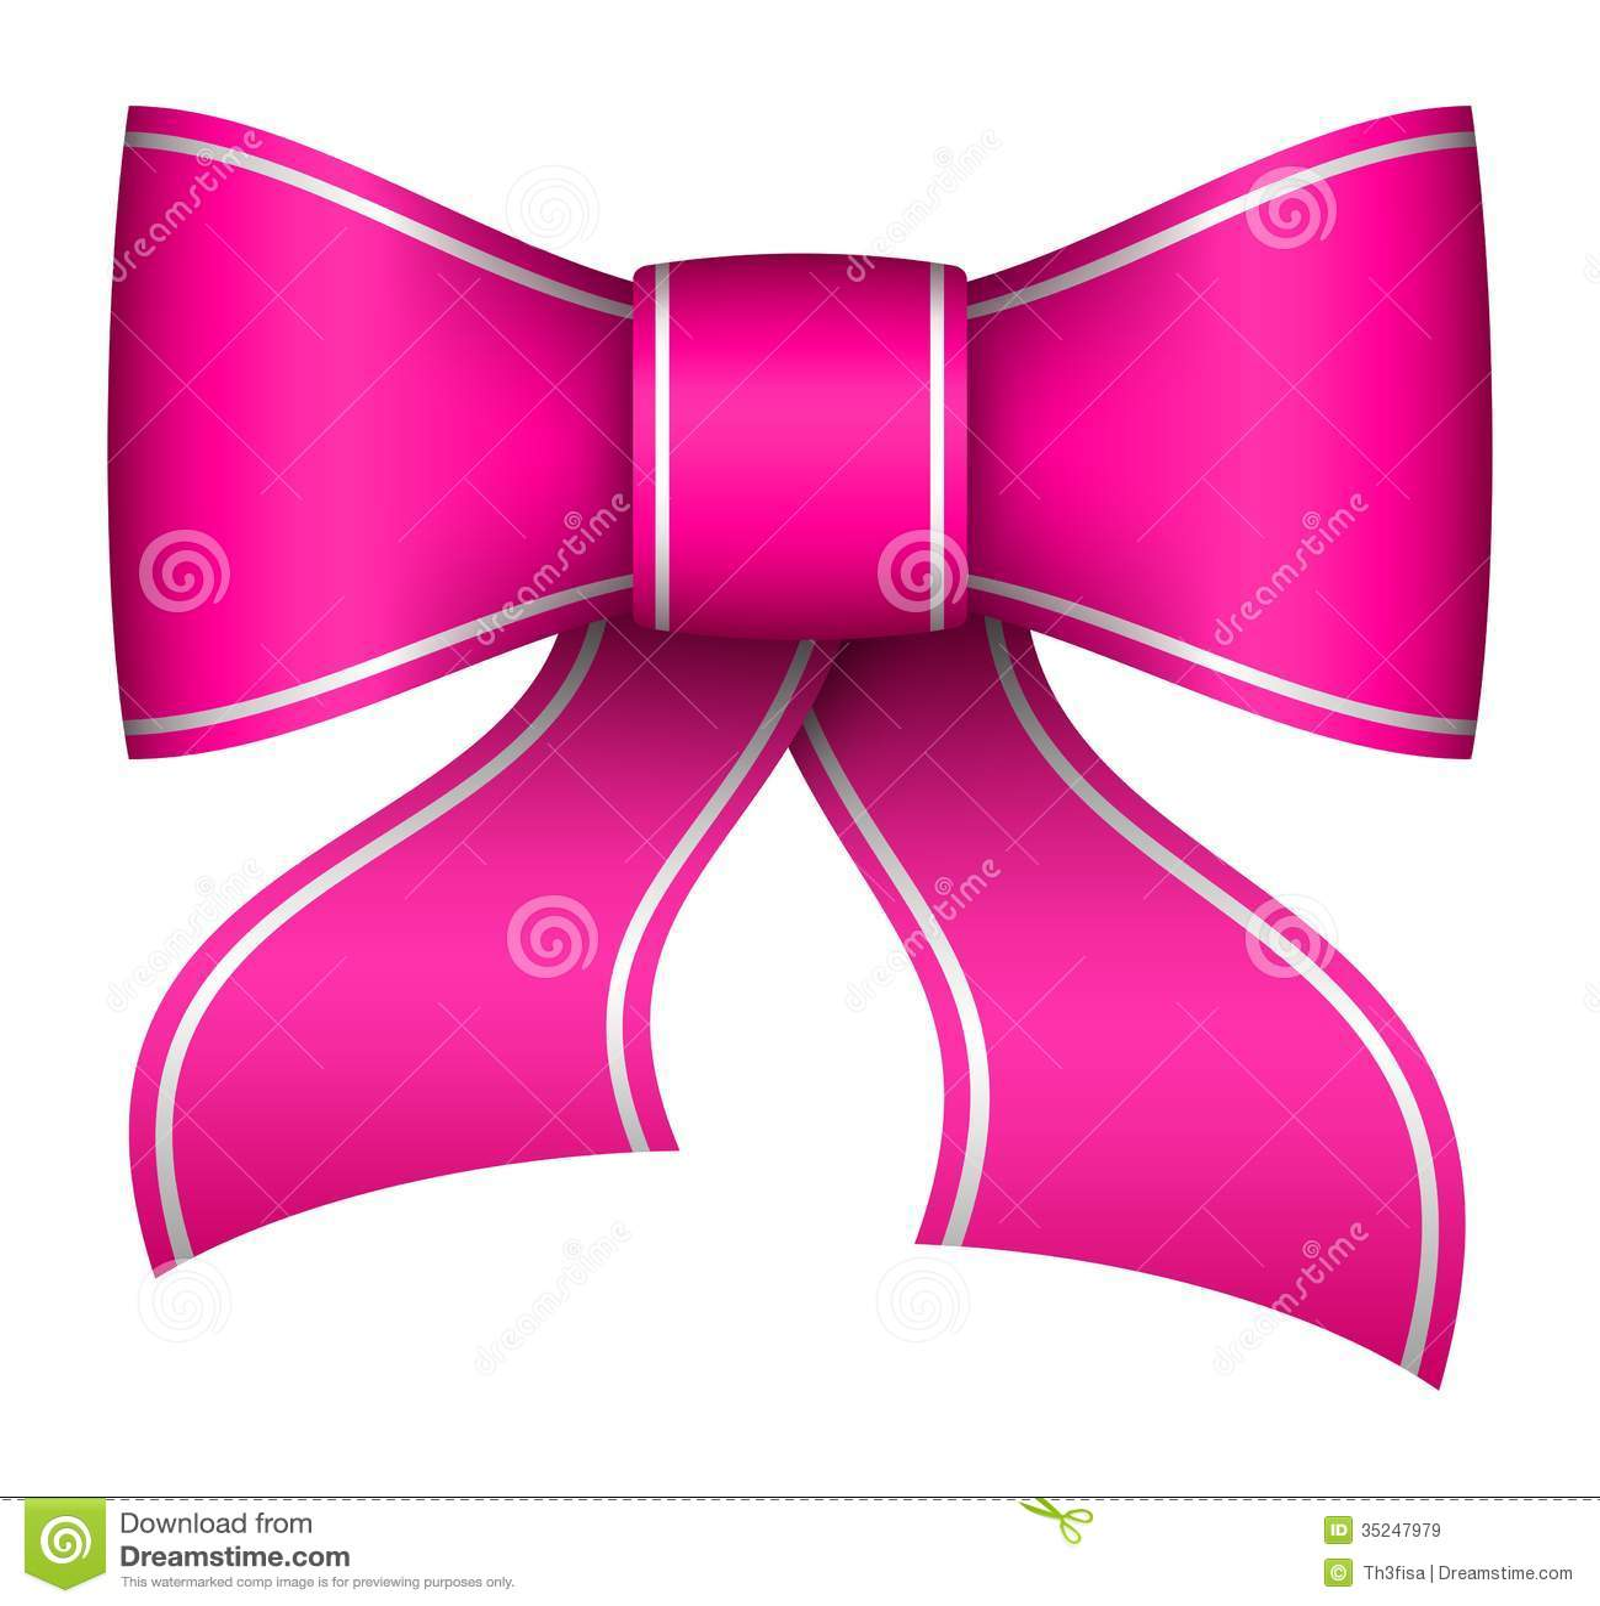 Pink Christmas Ribbon Bow Royalty Free Stock Images - Image: 35247979